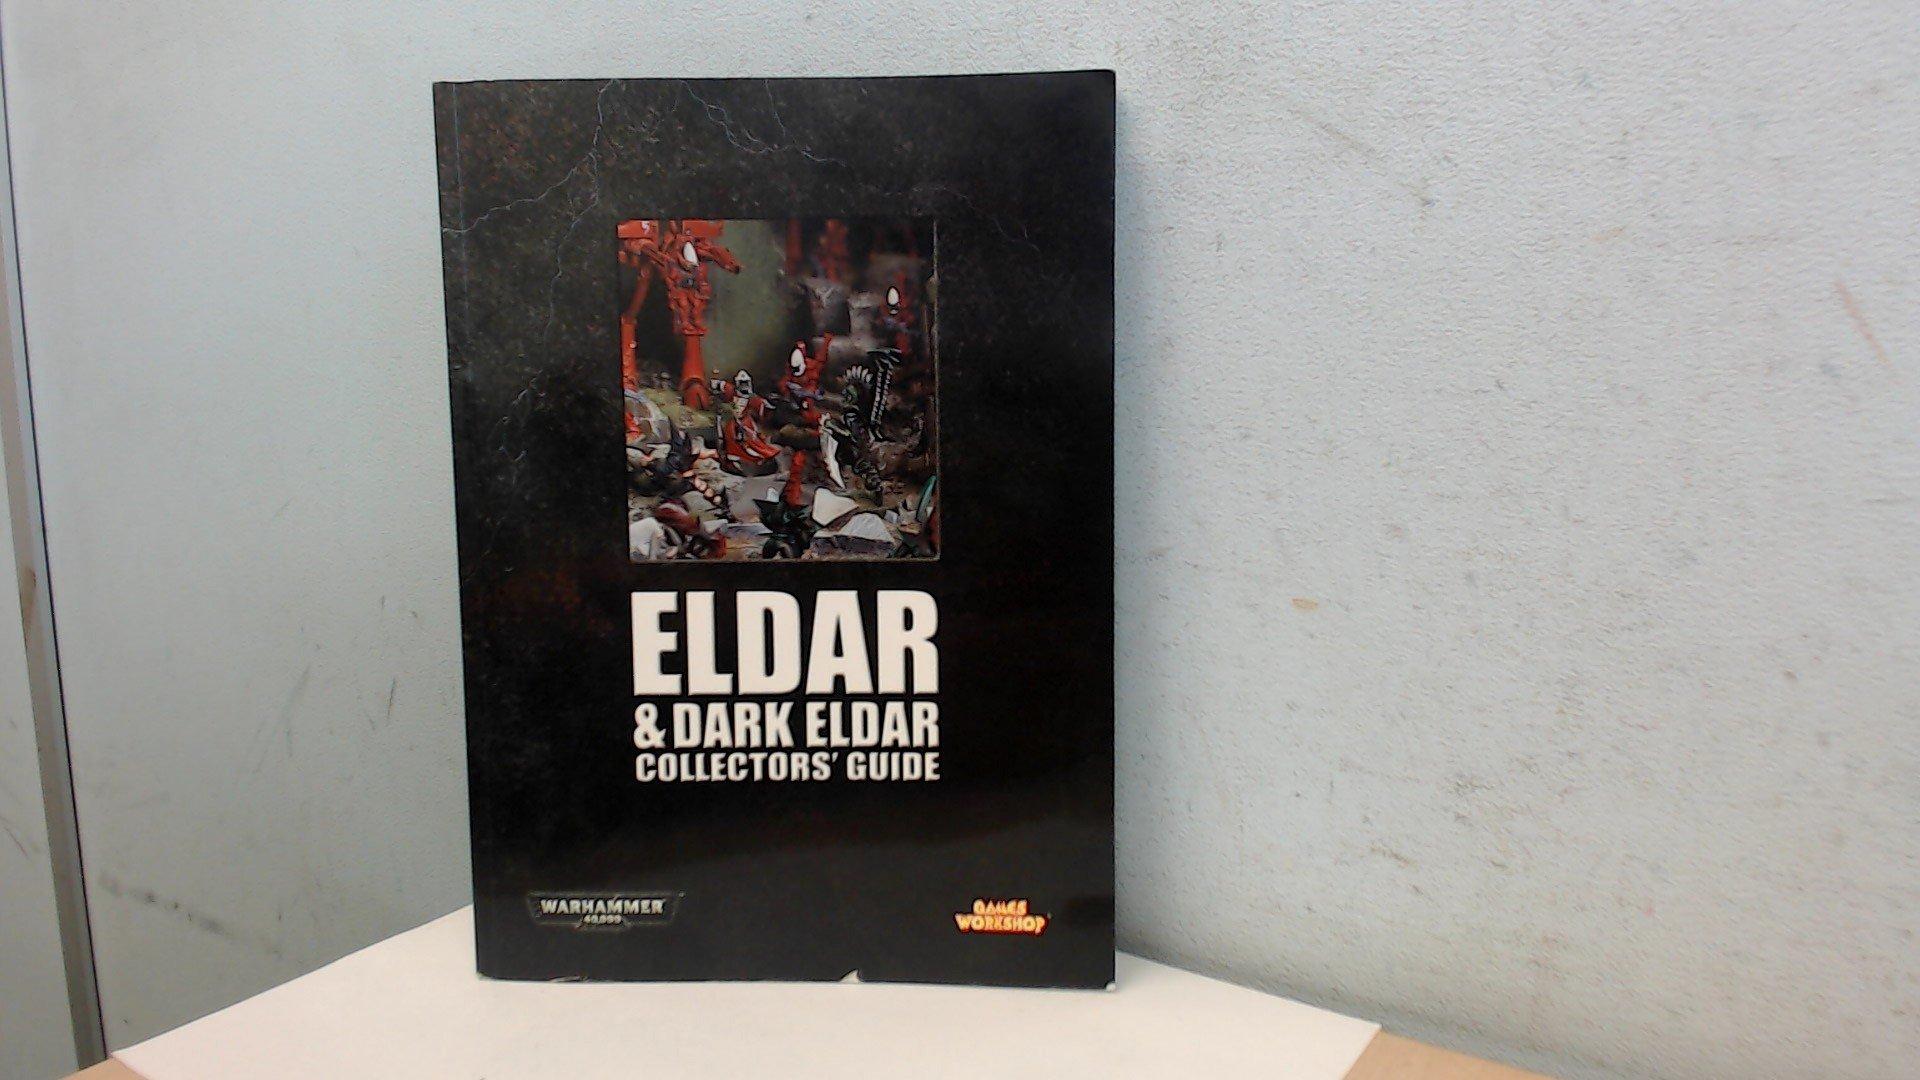 Download Eldar & Dark Eldar Collectors' Guide (Warhammer 40,000) pdf